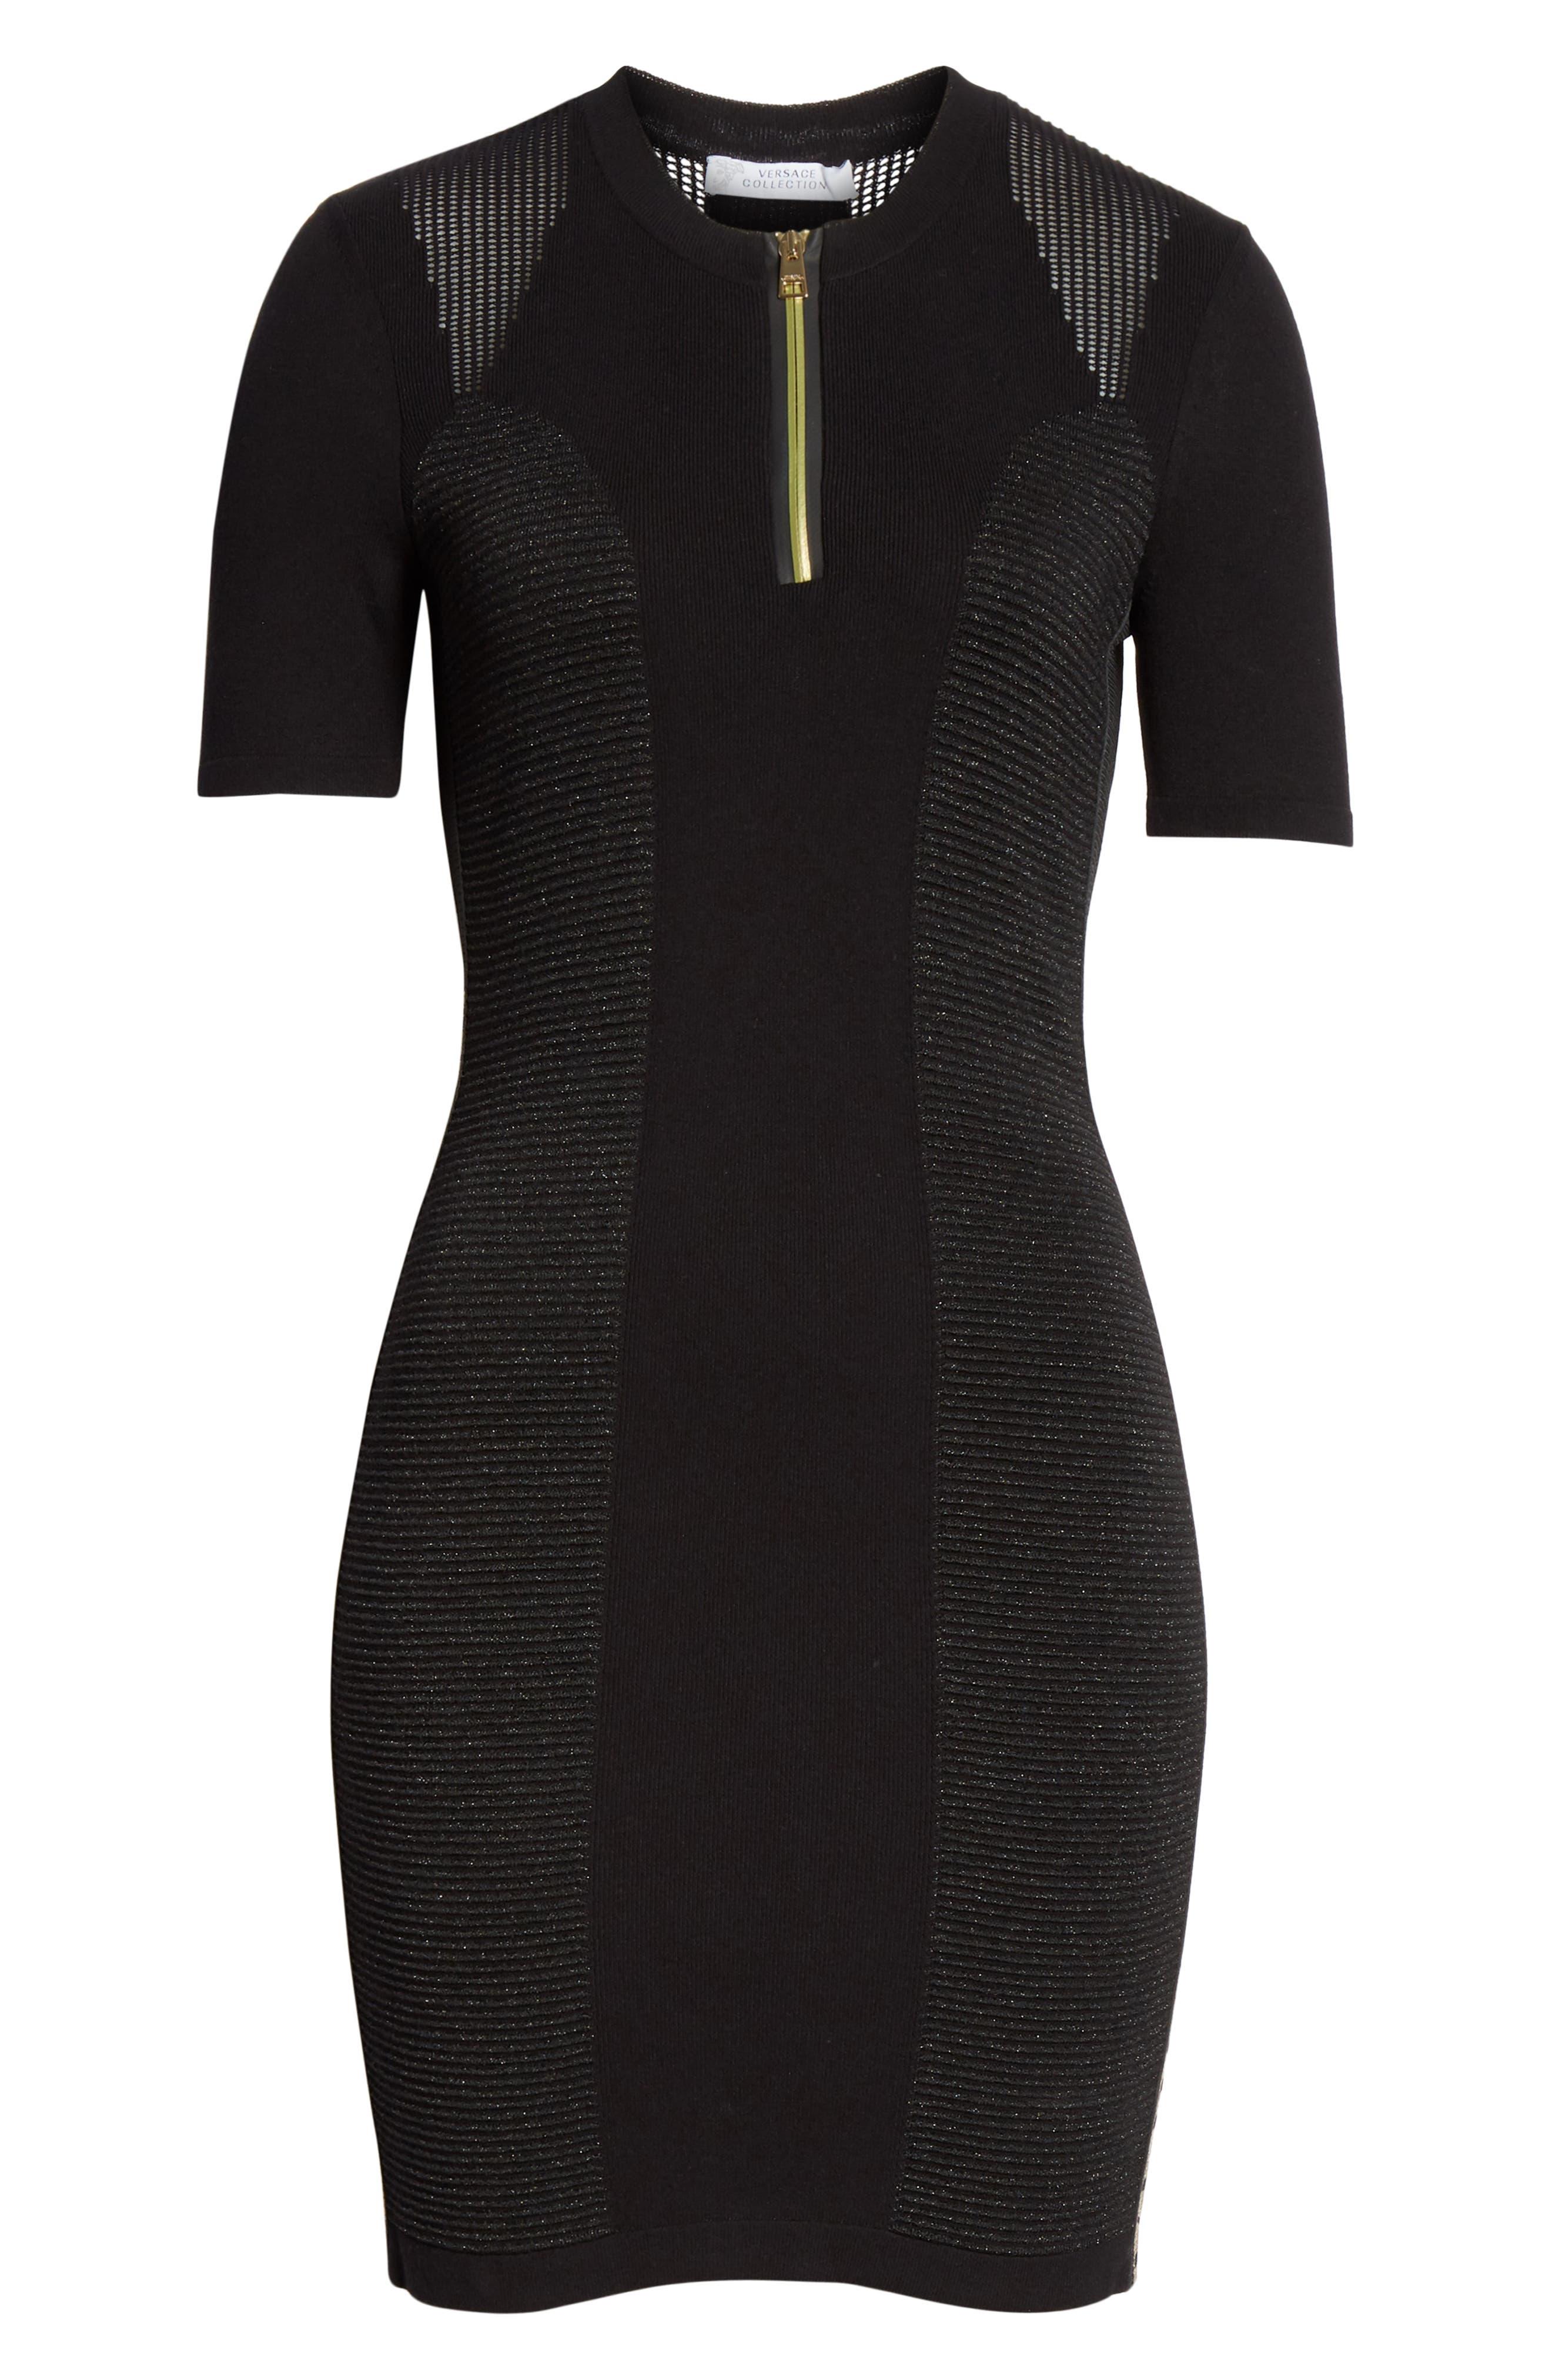 VERSACE COLLECTION, Logo Trim Body-Con Dress, Alternate thumbnail 7, color, BLACK